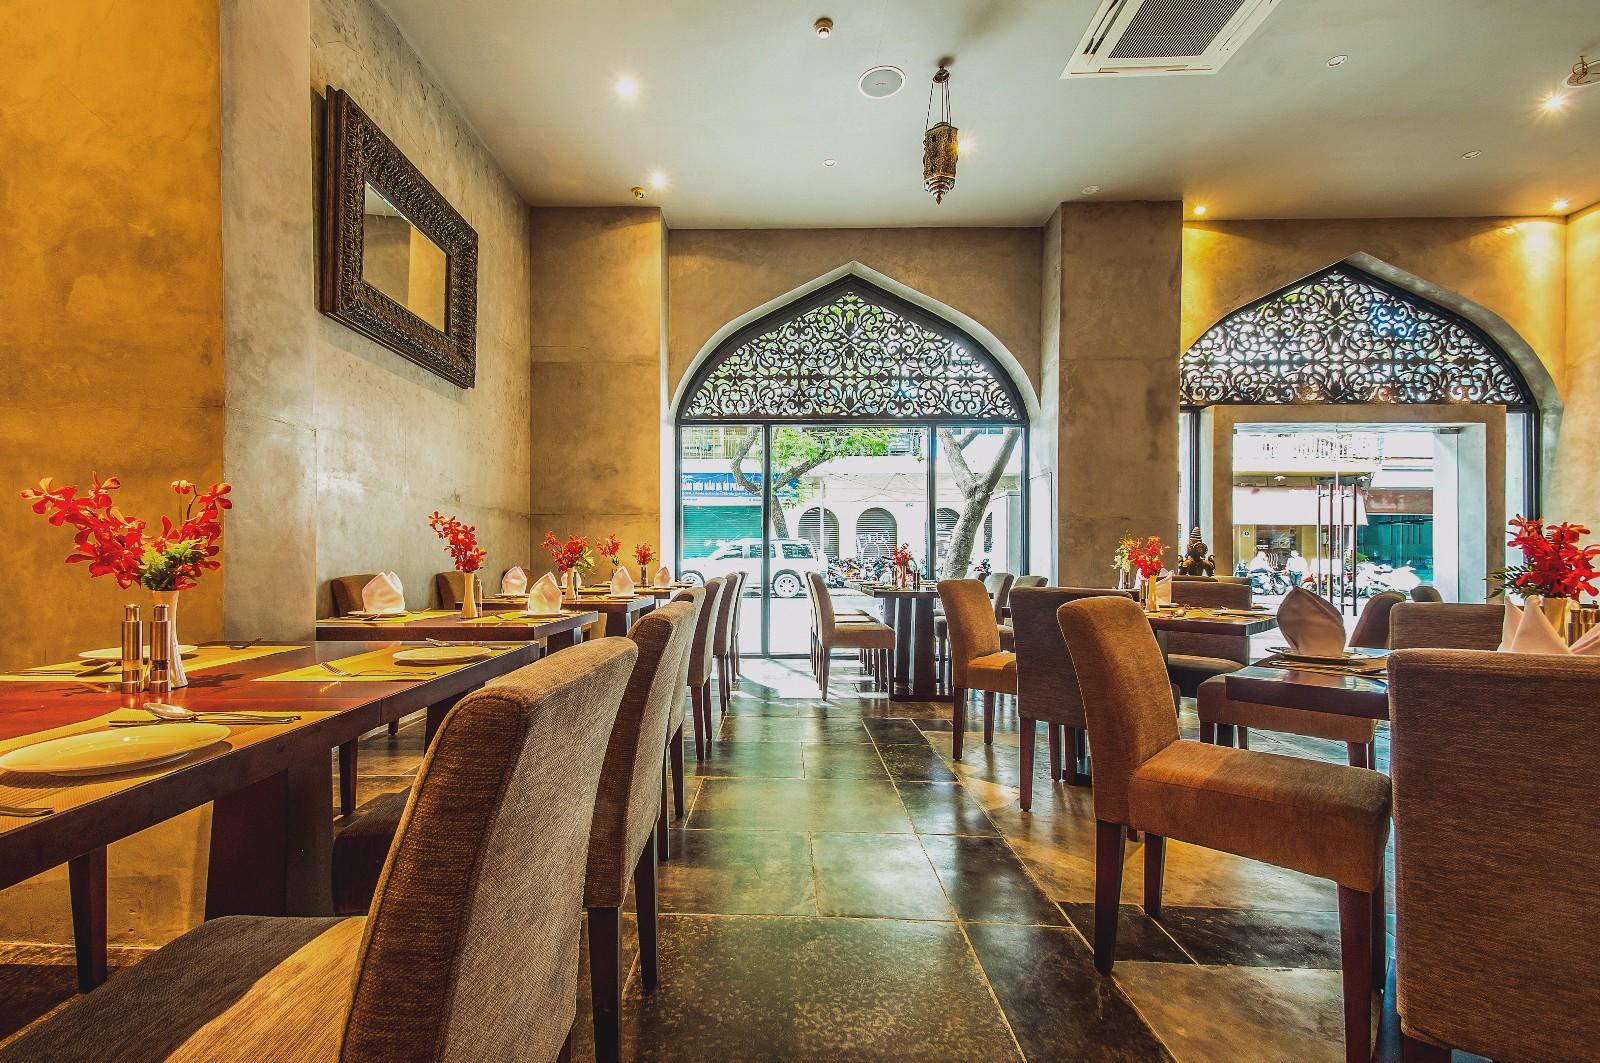 Tandoor Saigon - One of the best Indian restaurants in Ho Chi Minh City - Yallavietnam